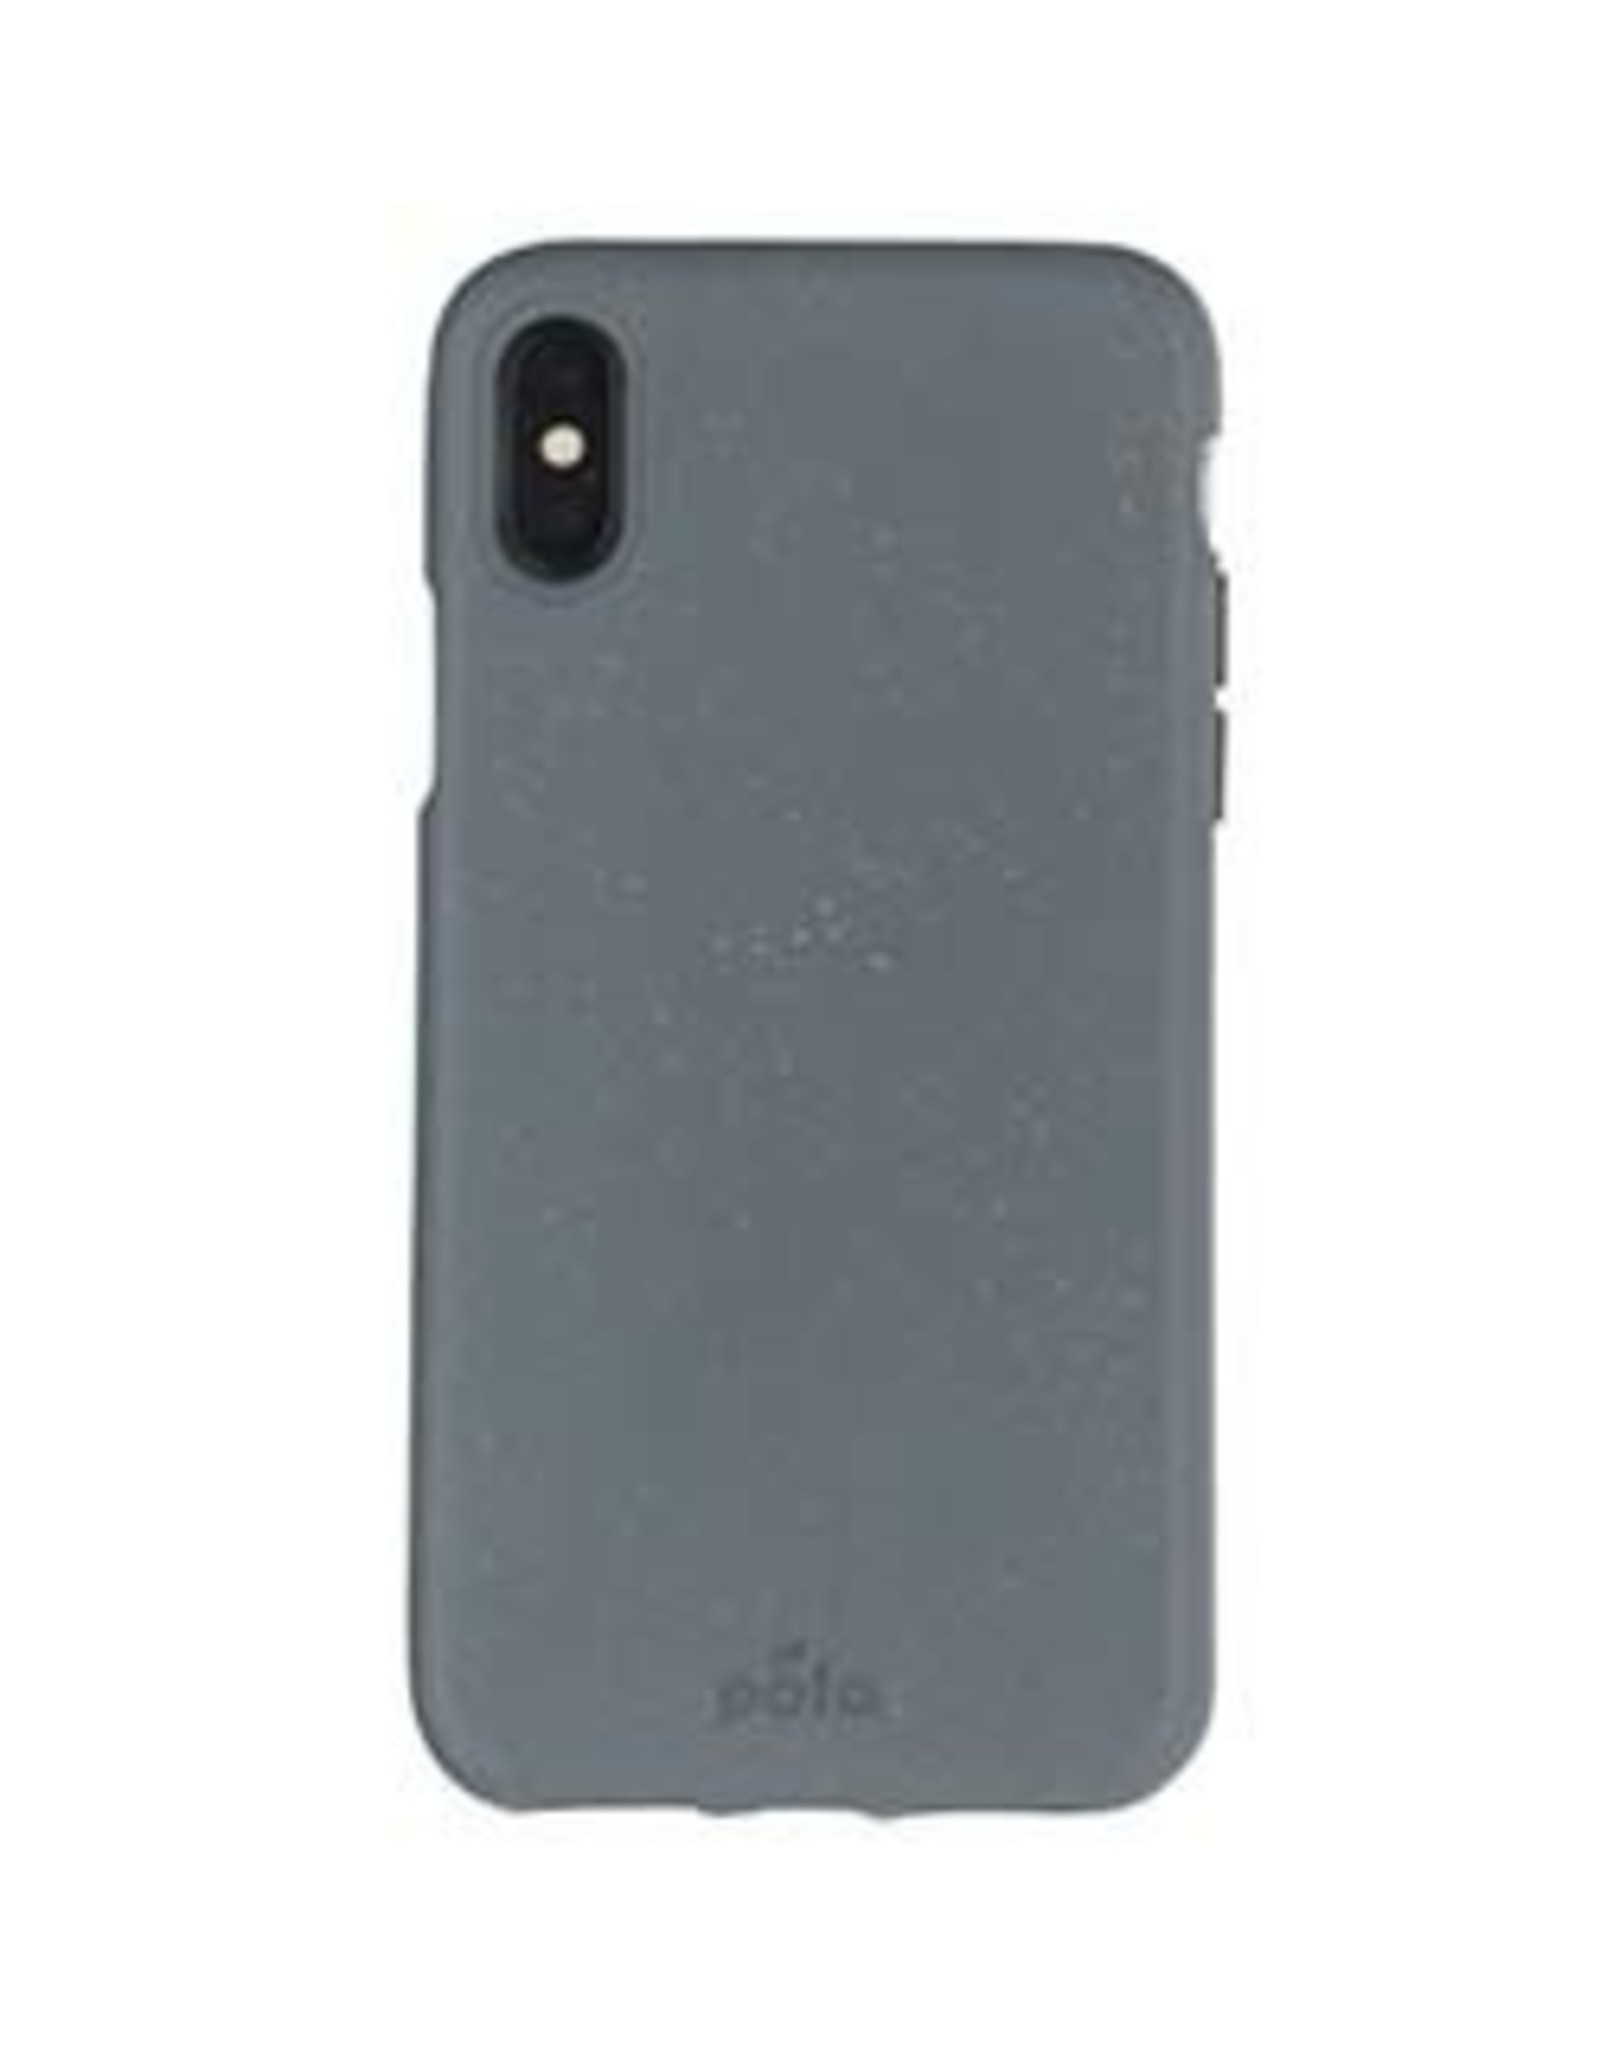 Pela Pela | iPhone Xs Max Grey (Shark Skin) Compostable Eco-Friendly Protective Case | 15-04722